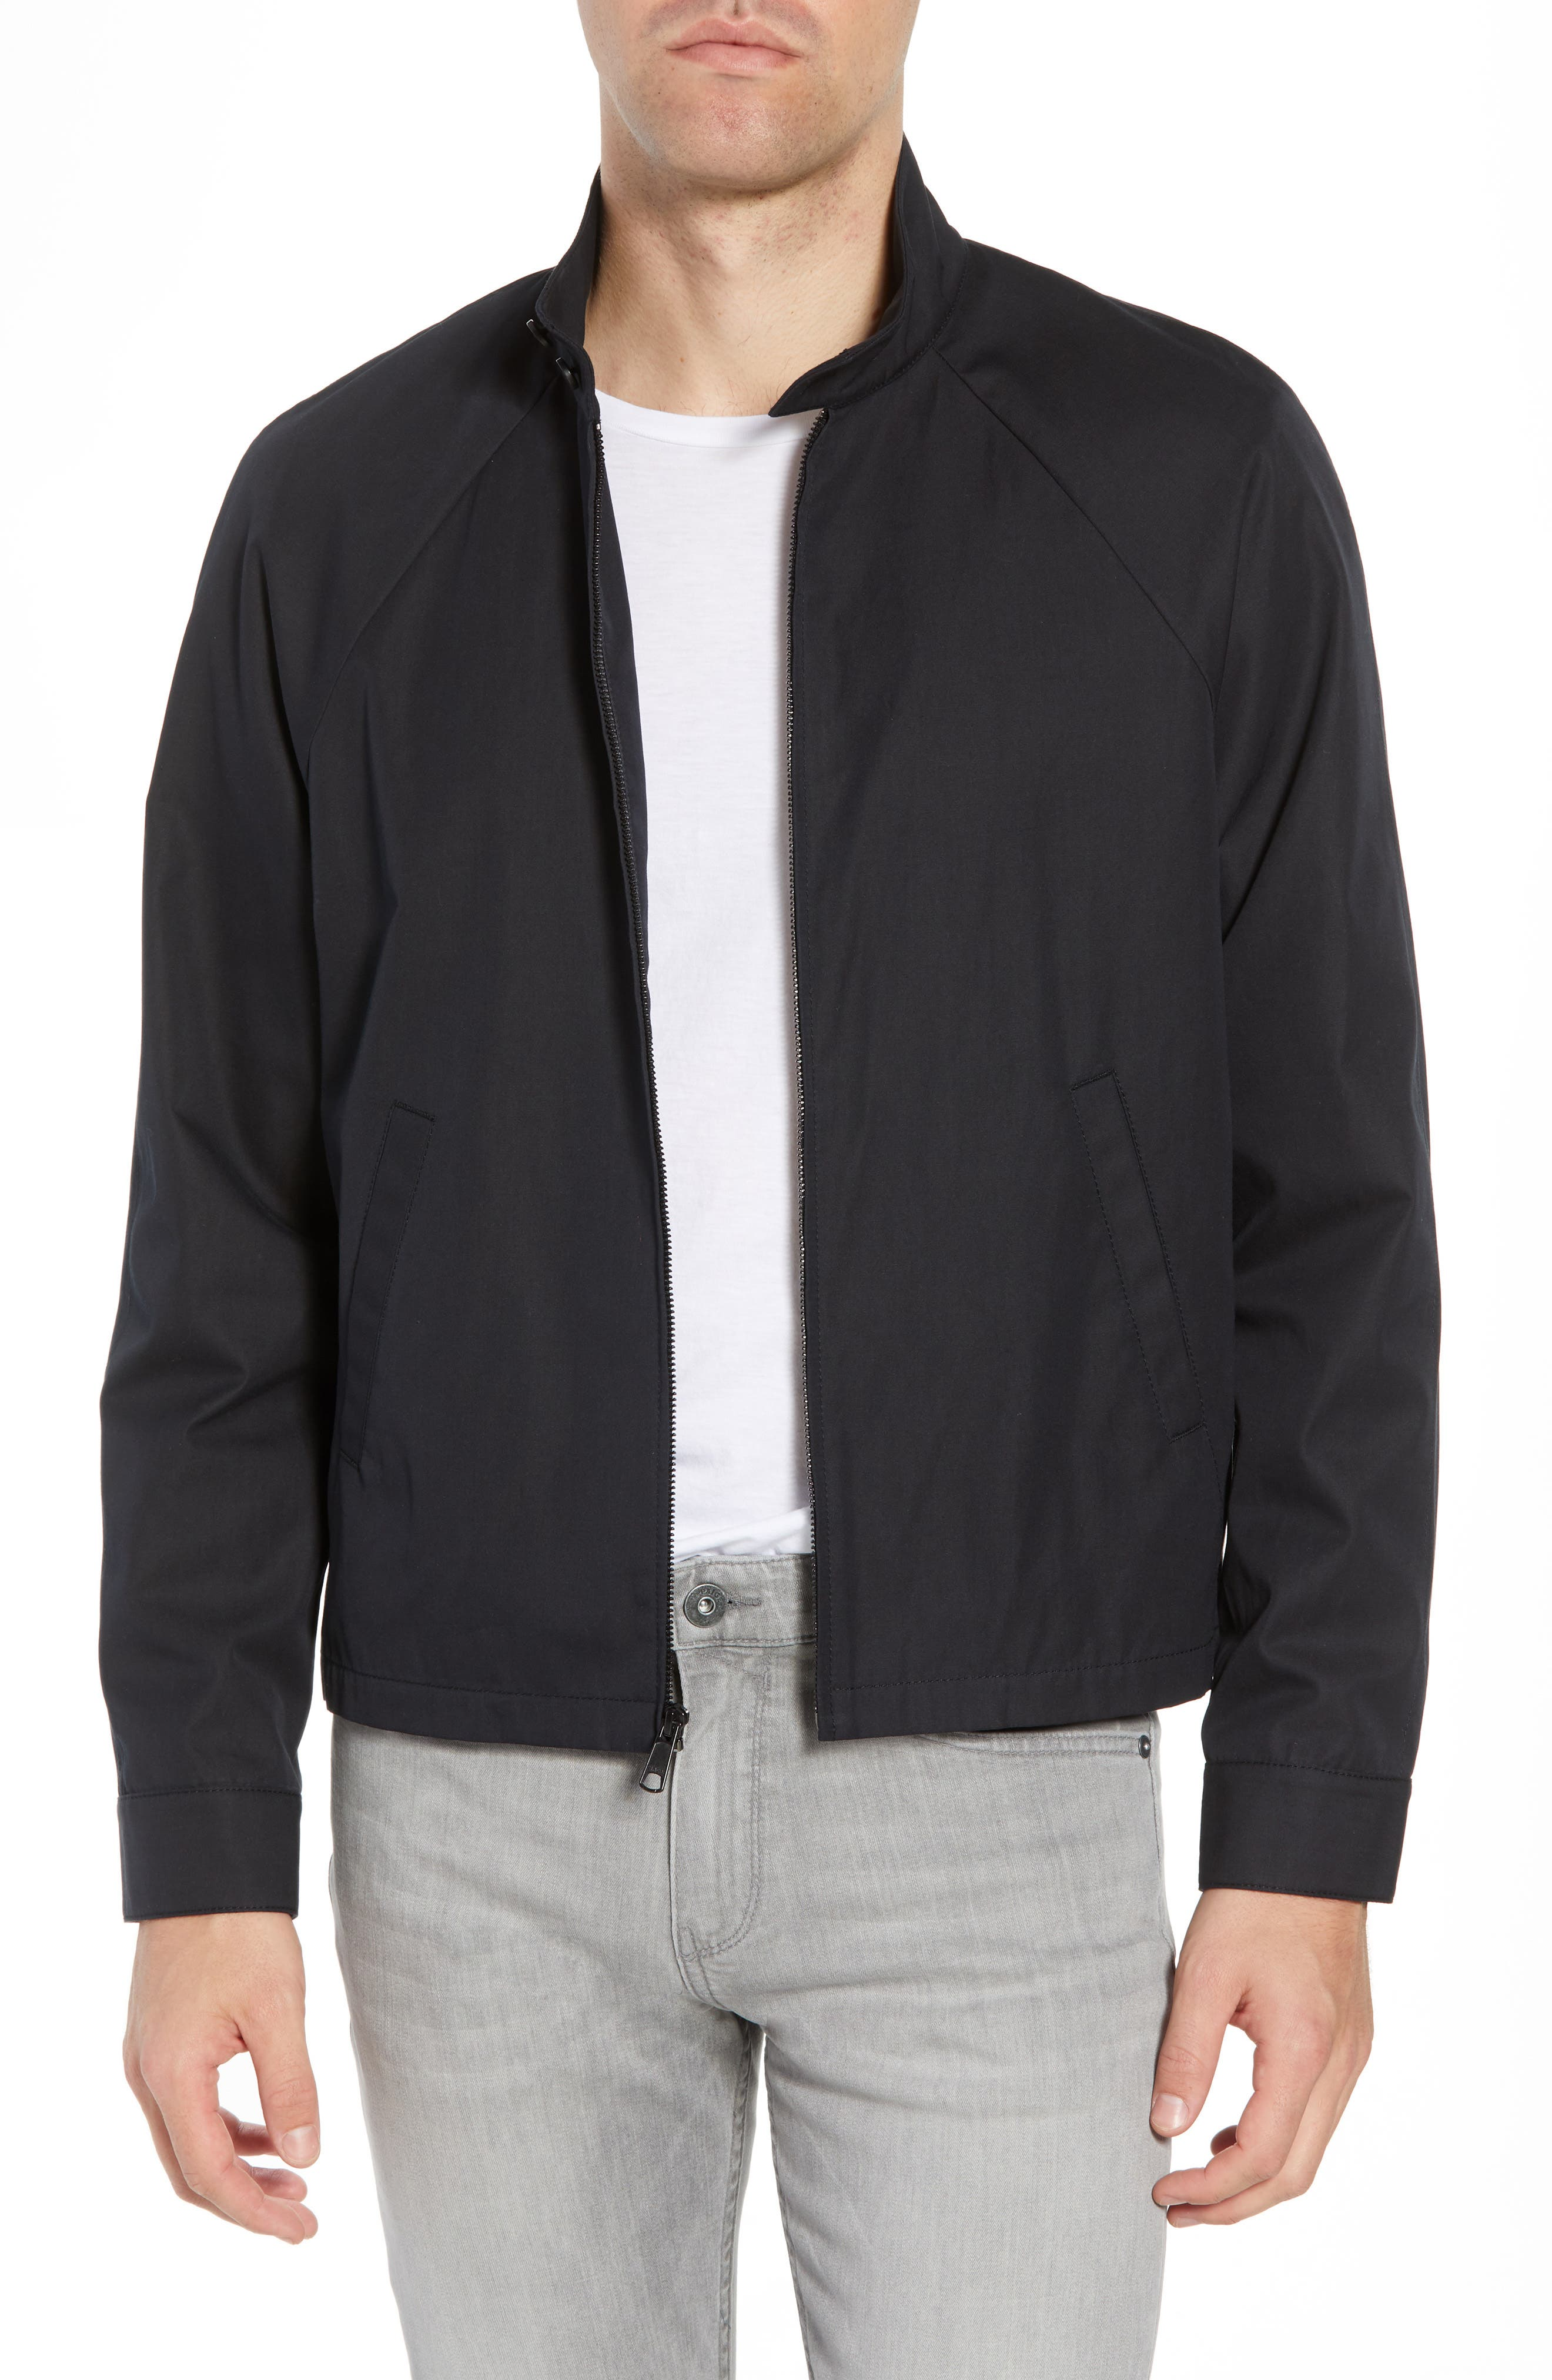 Regular Fit Jacket,                             Main thumbnail 1, color,                             001